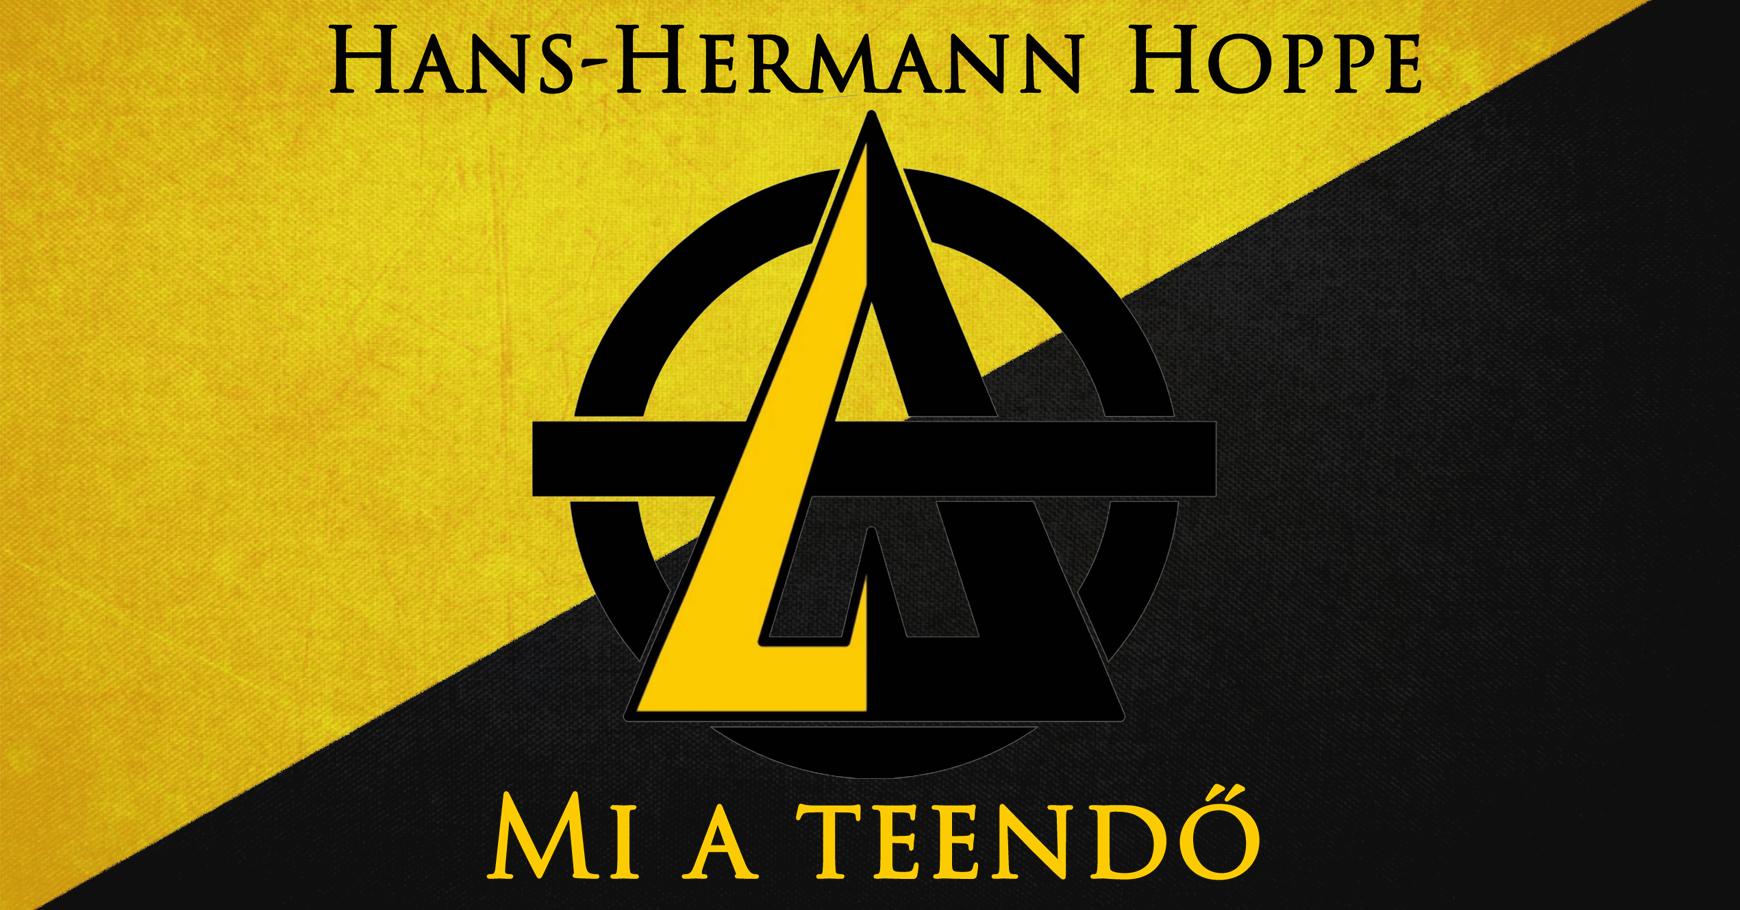 Hans-Hermann Hoppe – Mi a teendő